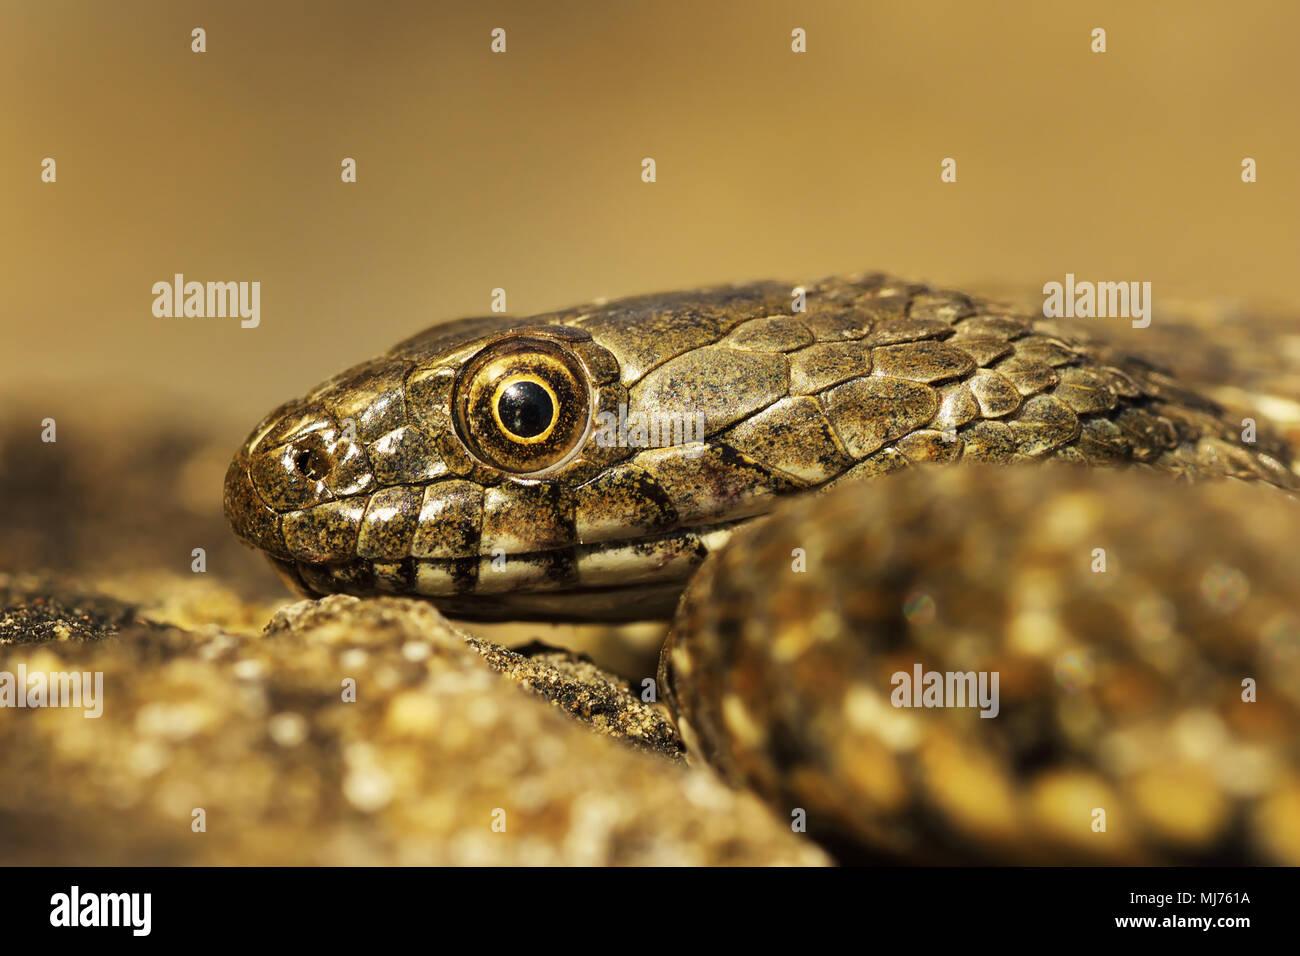 juvenile dice snake portrait ( Natrix tessellata ) - Stock Image